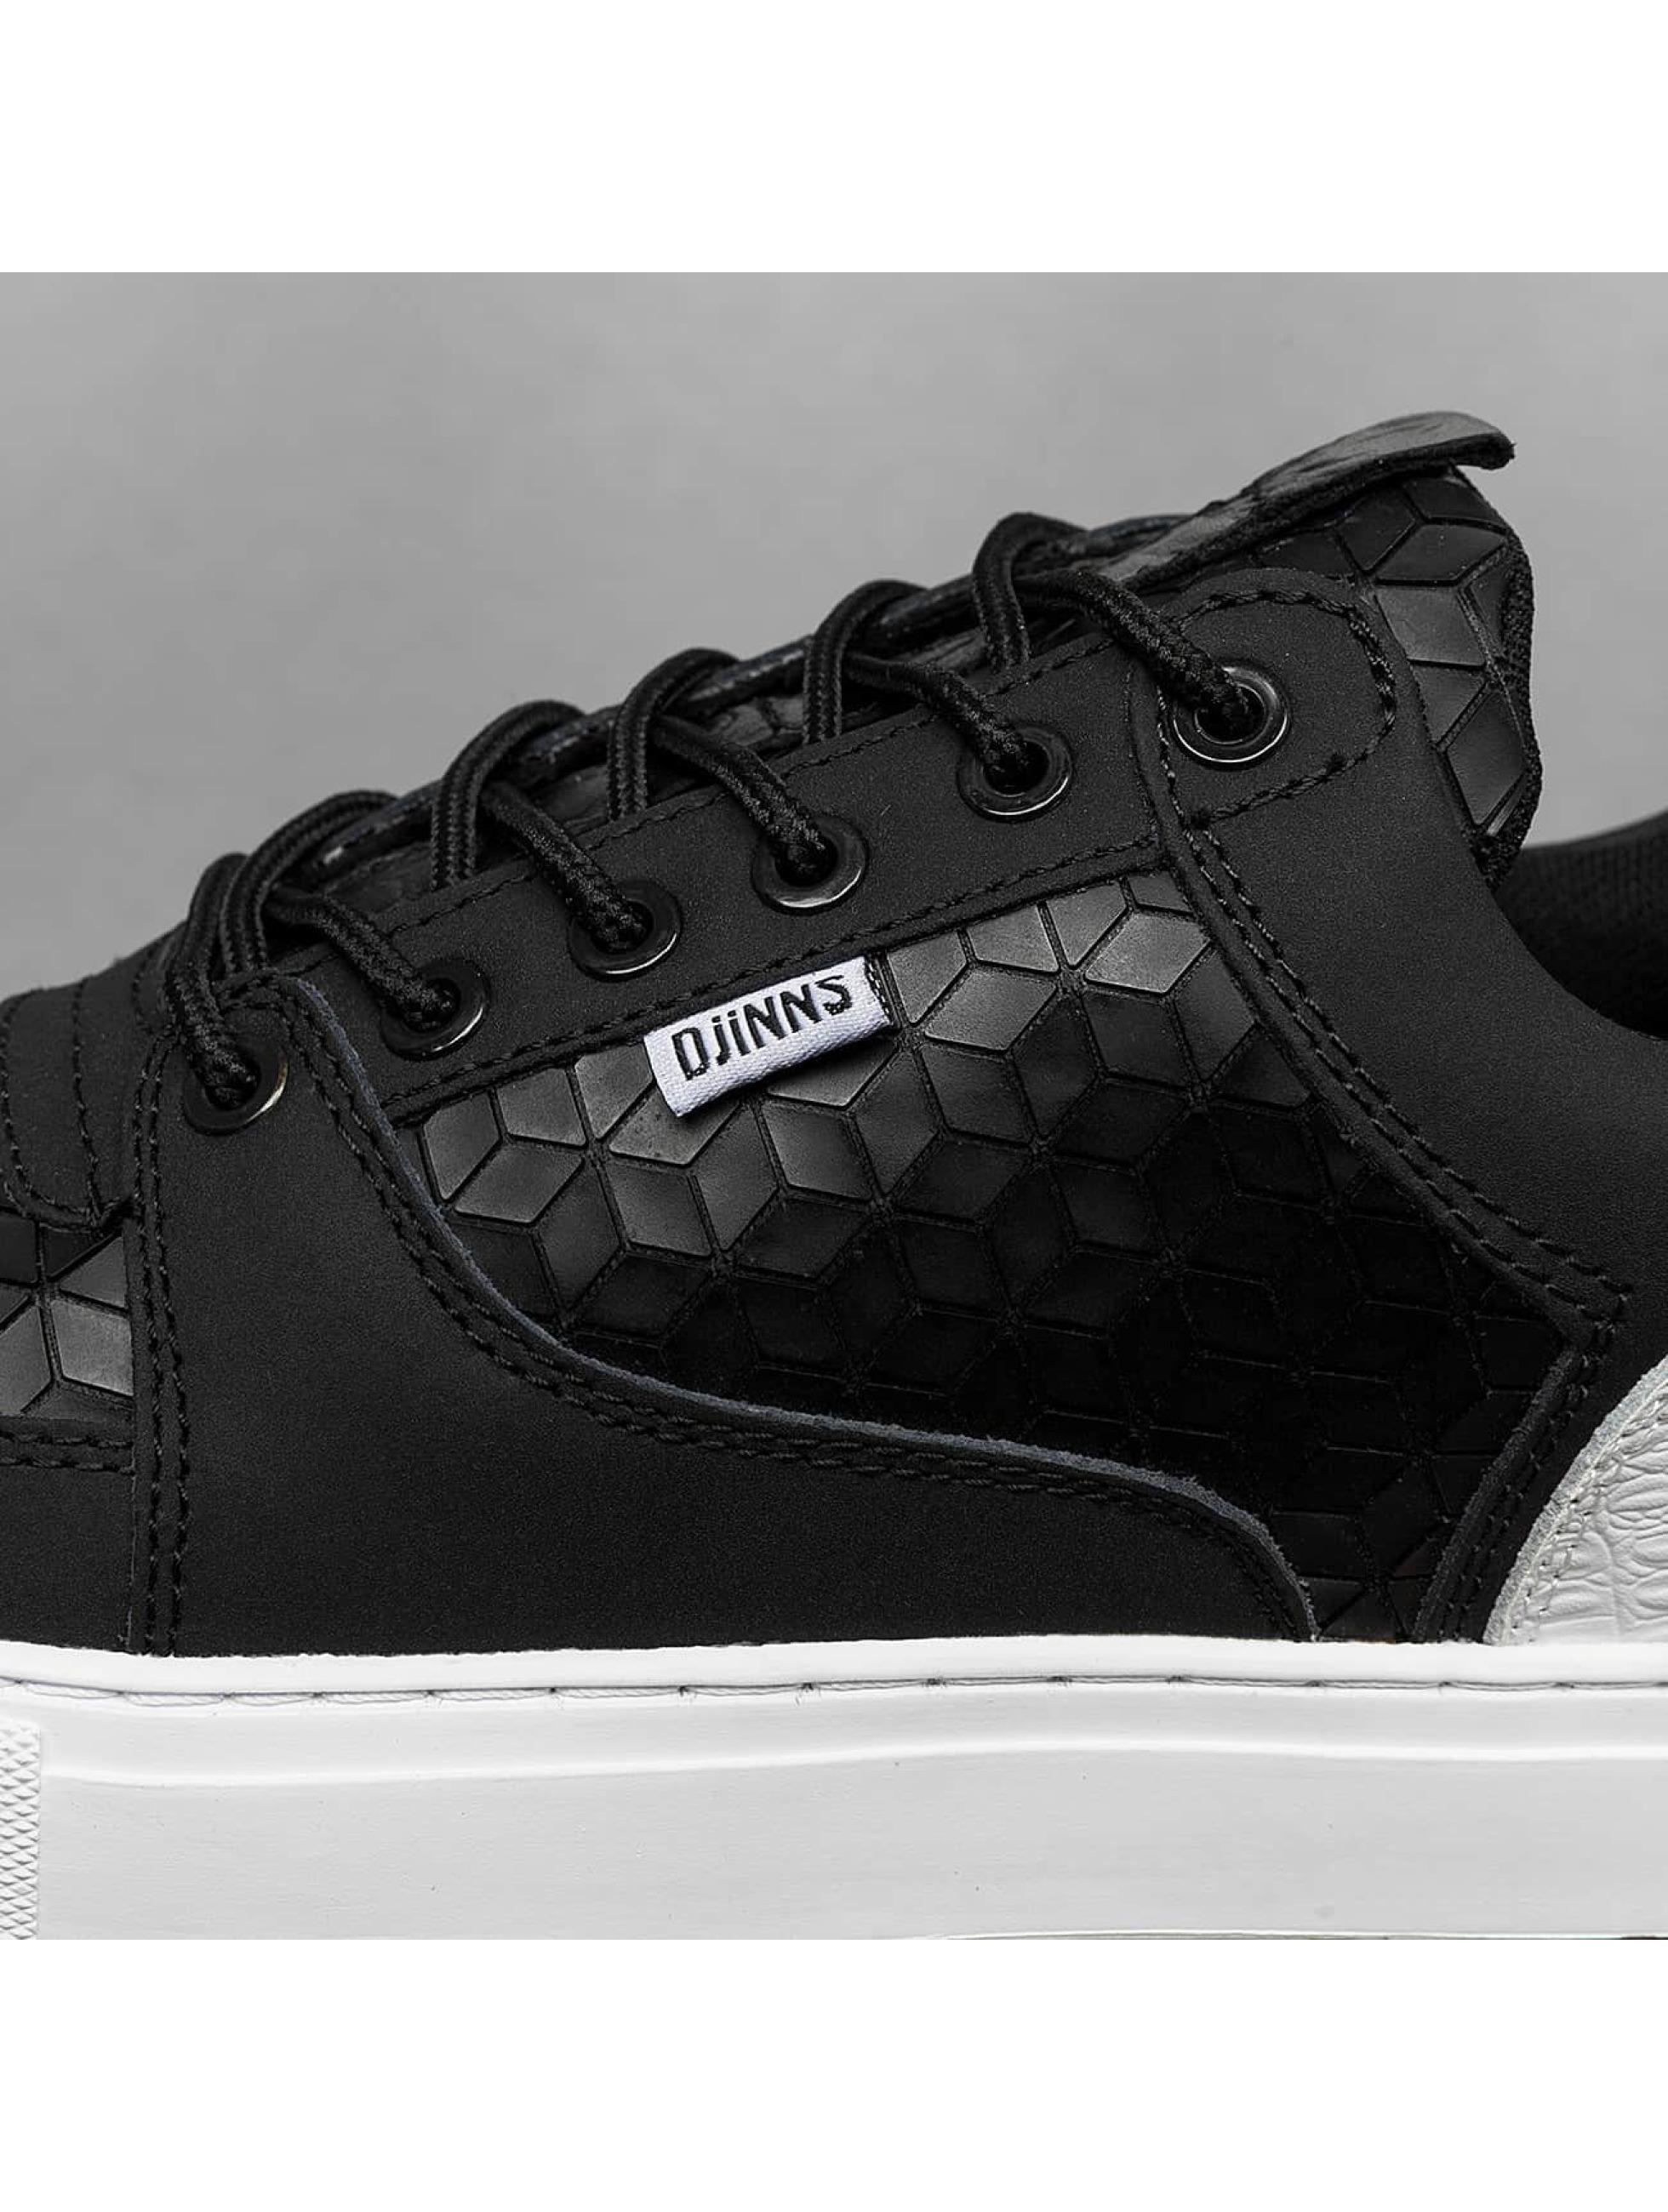 Djinns Sneaker Forlow Rubber Croc schwarz